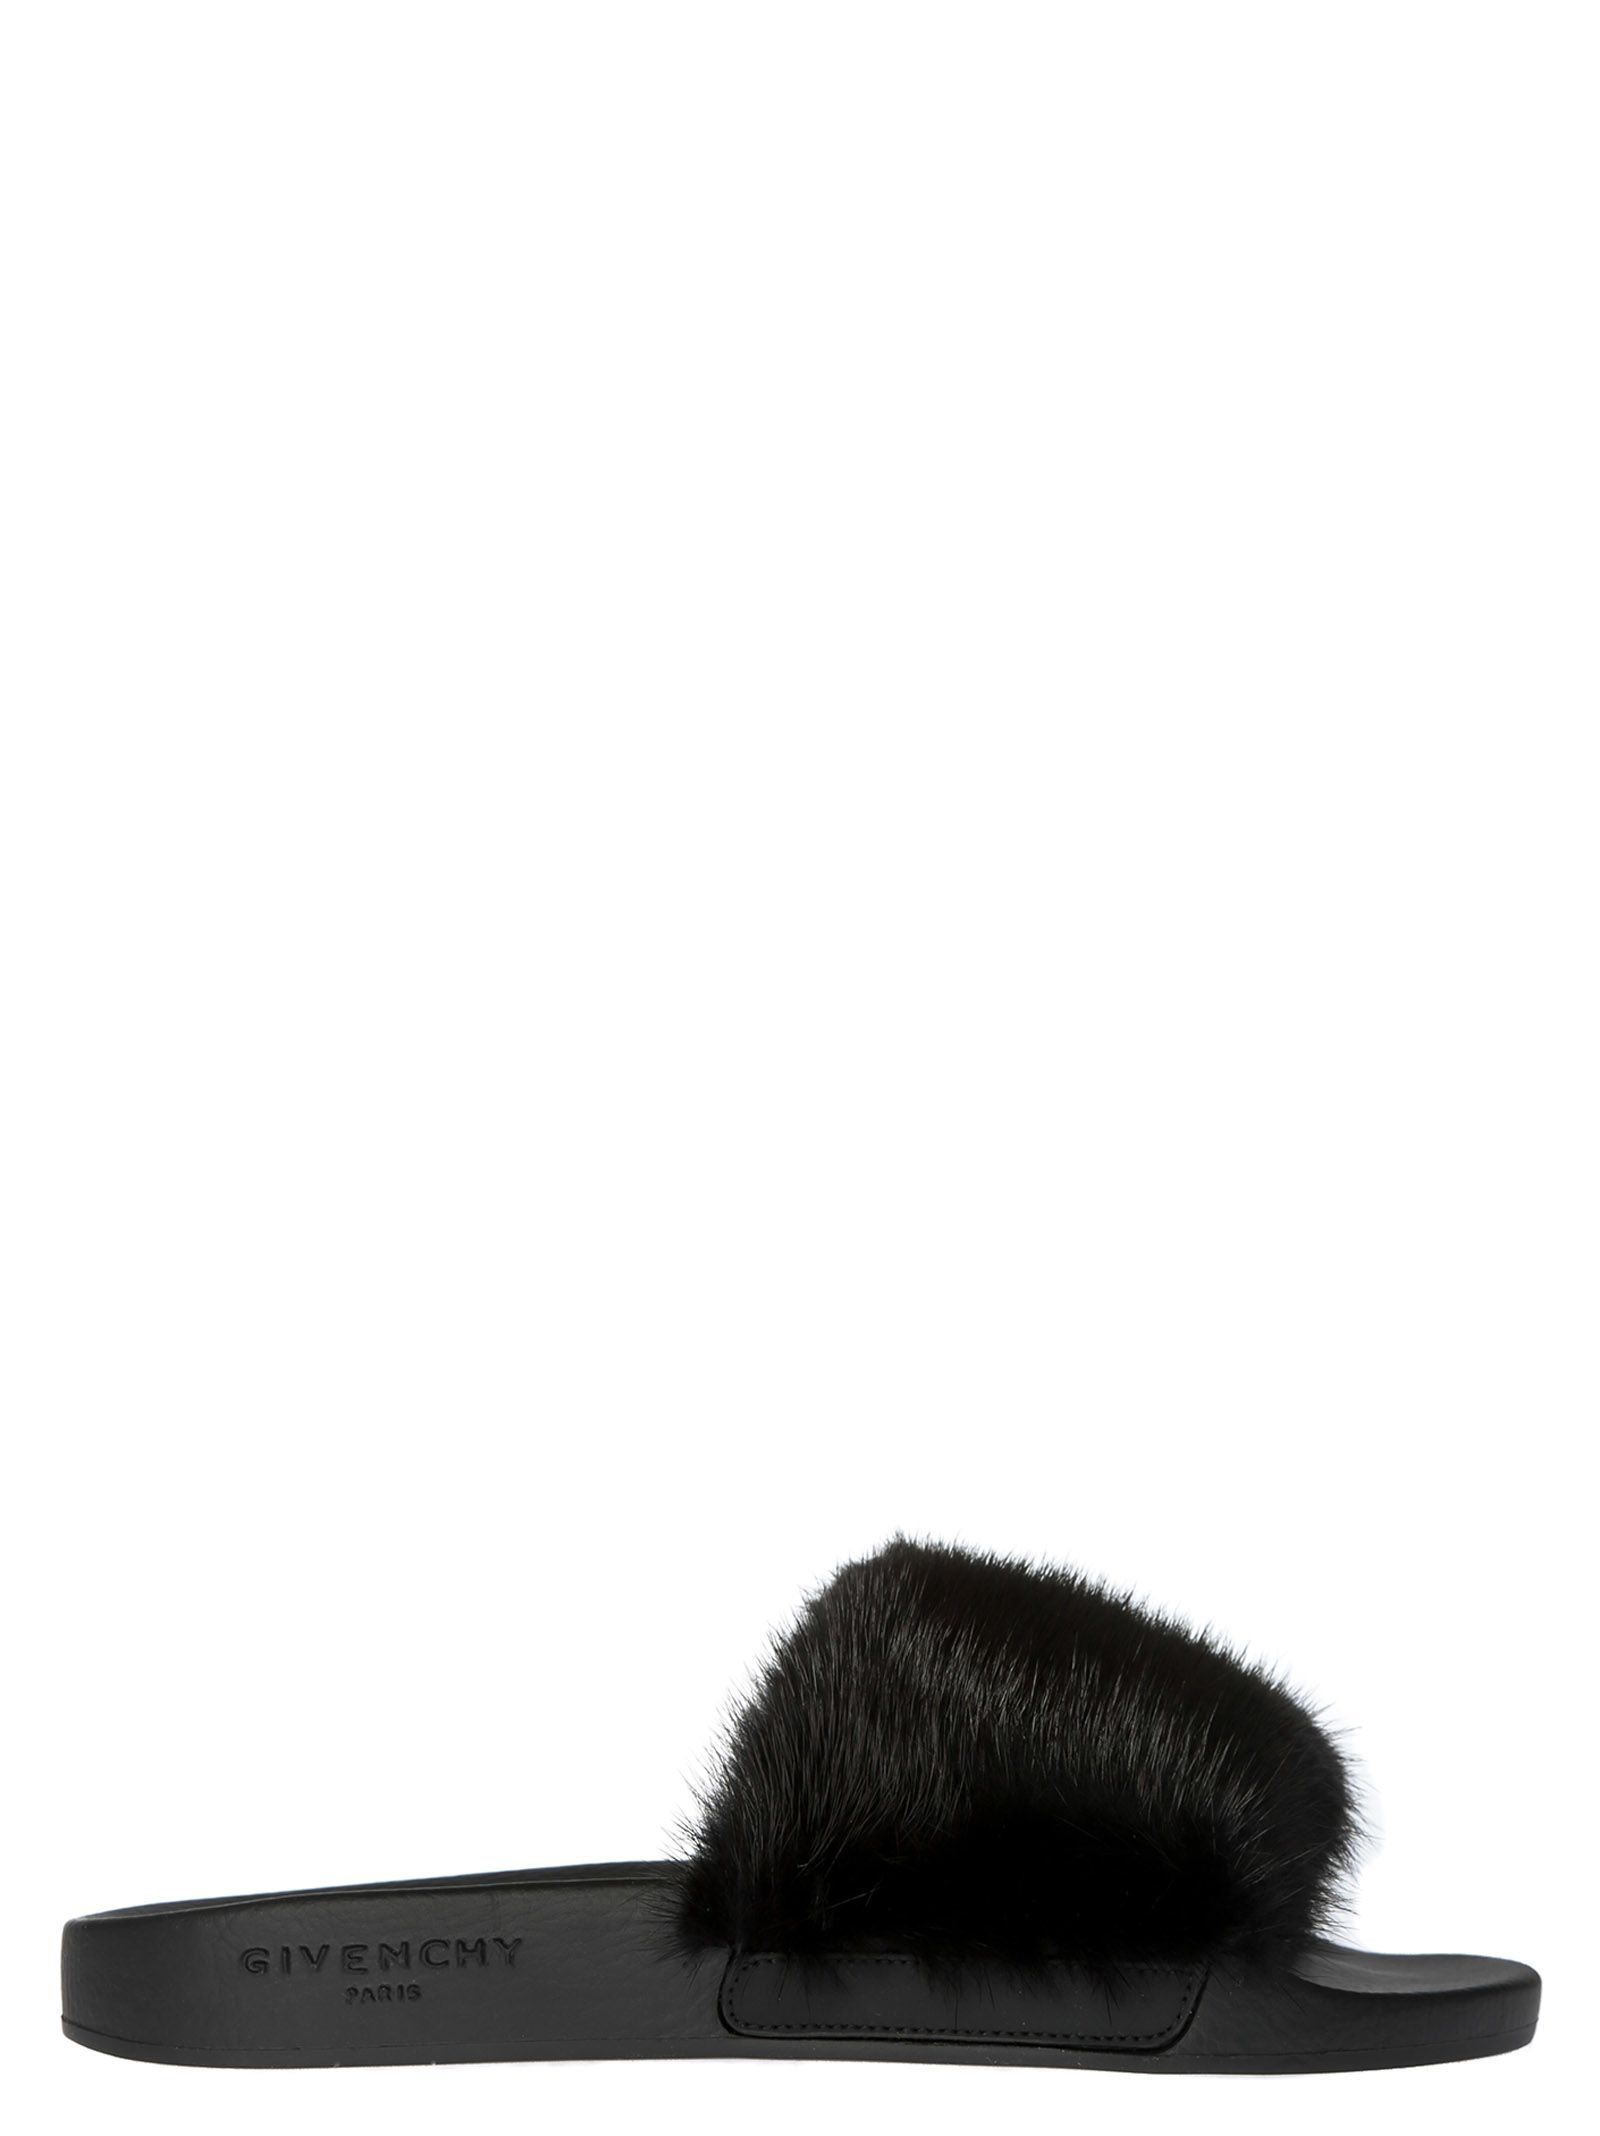 Givenchy Fur flat shoes vJ1TK